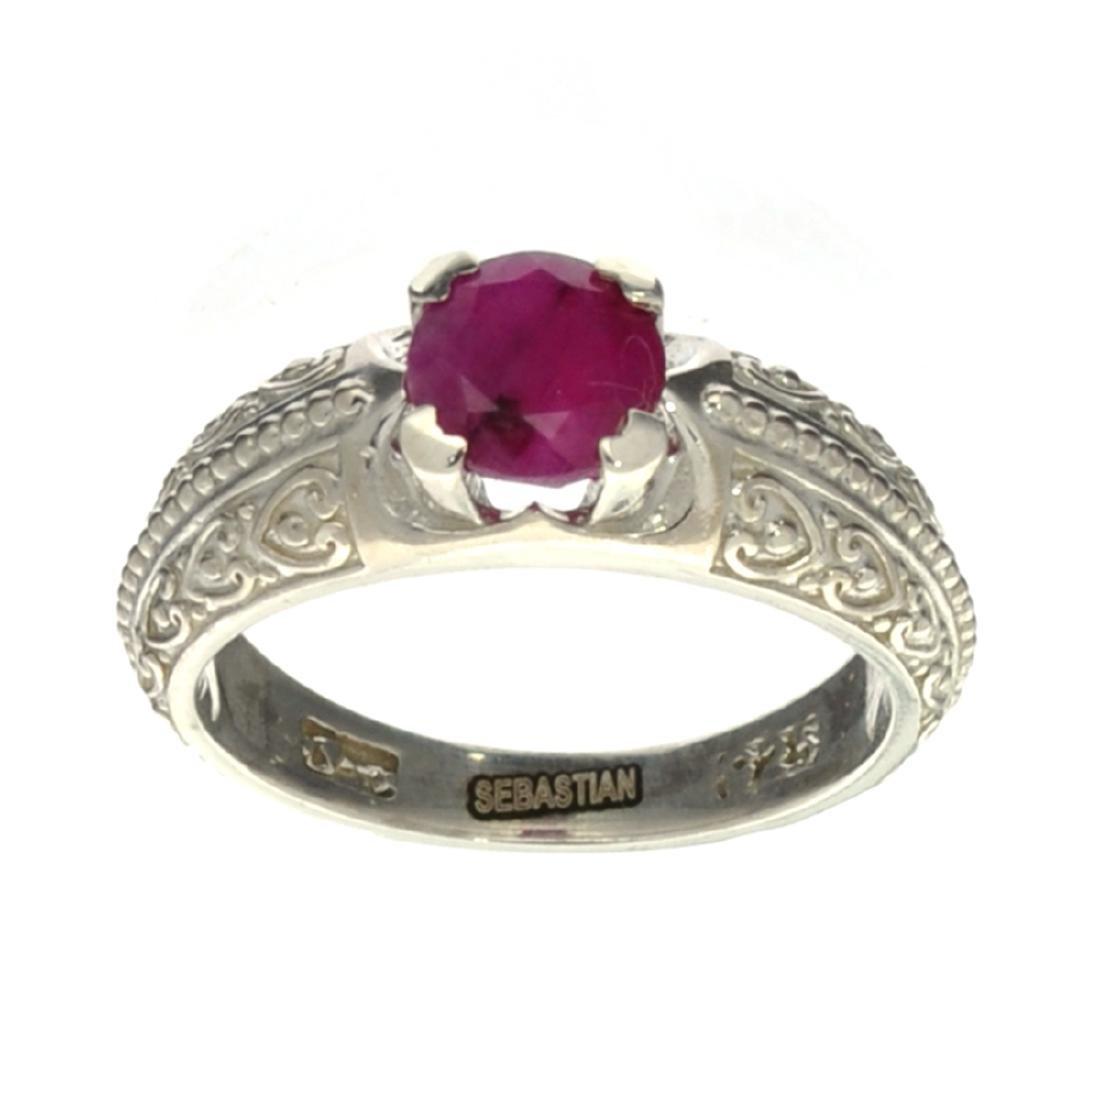 APP: 0.5k Fine Jewelry Designer Sebastian, 1.12CT Round